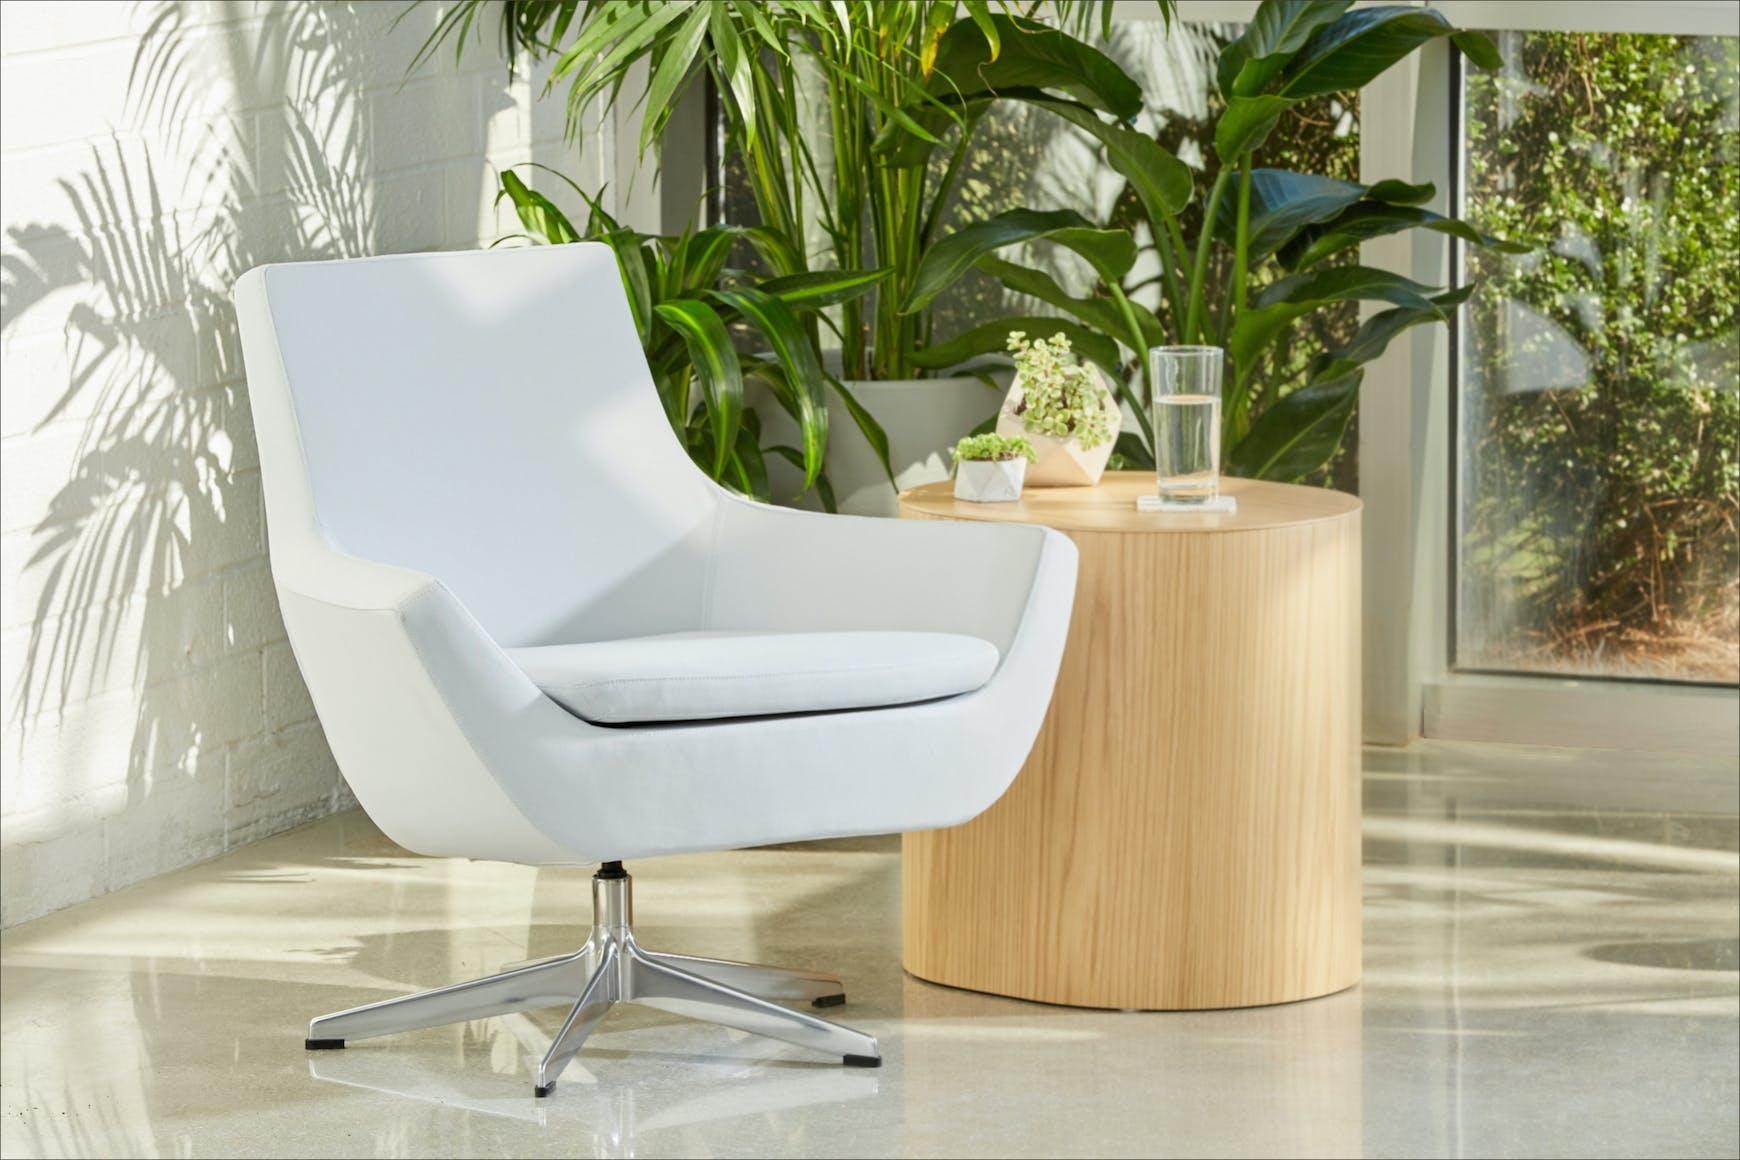 Miraculous Hightower Machost Co Dining Chair Design Ideas Machostcouk